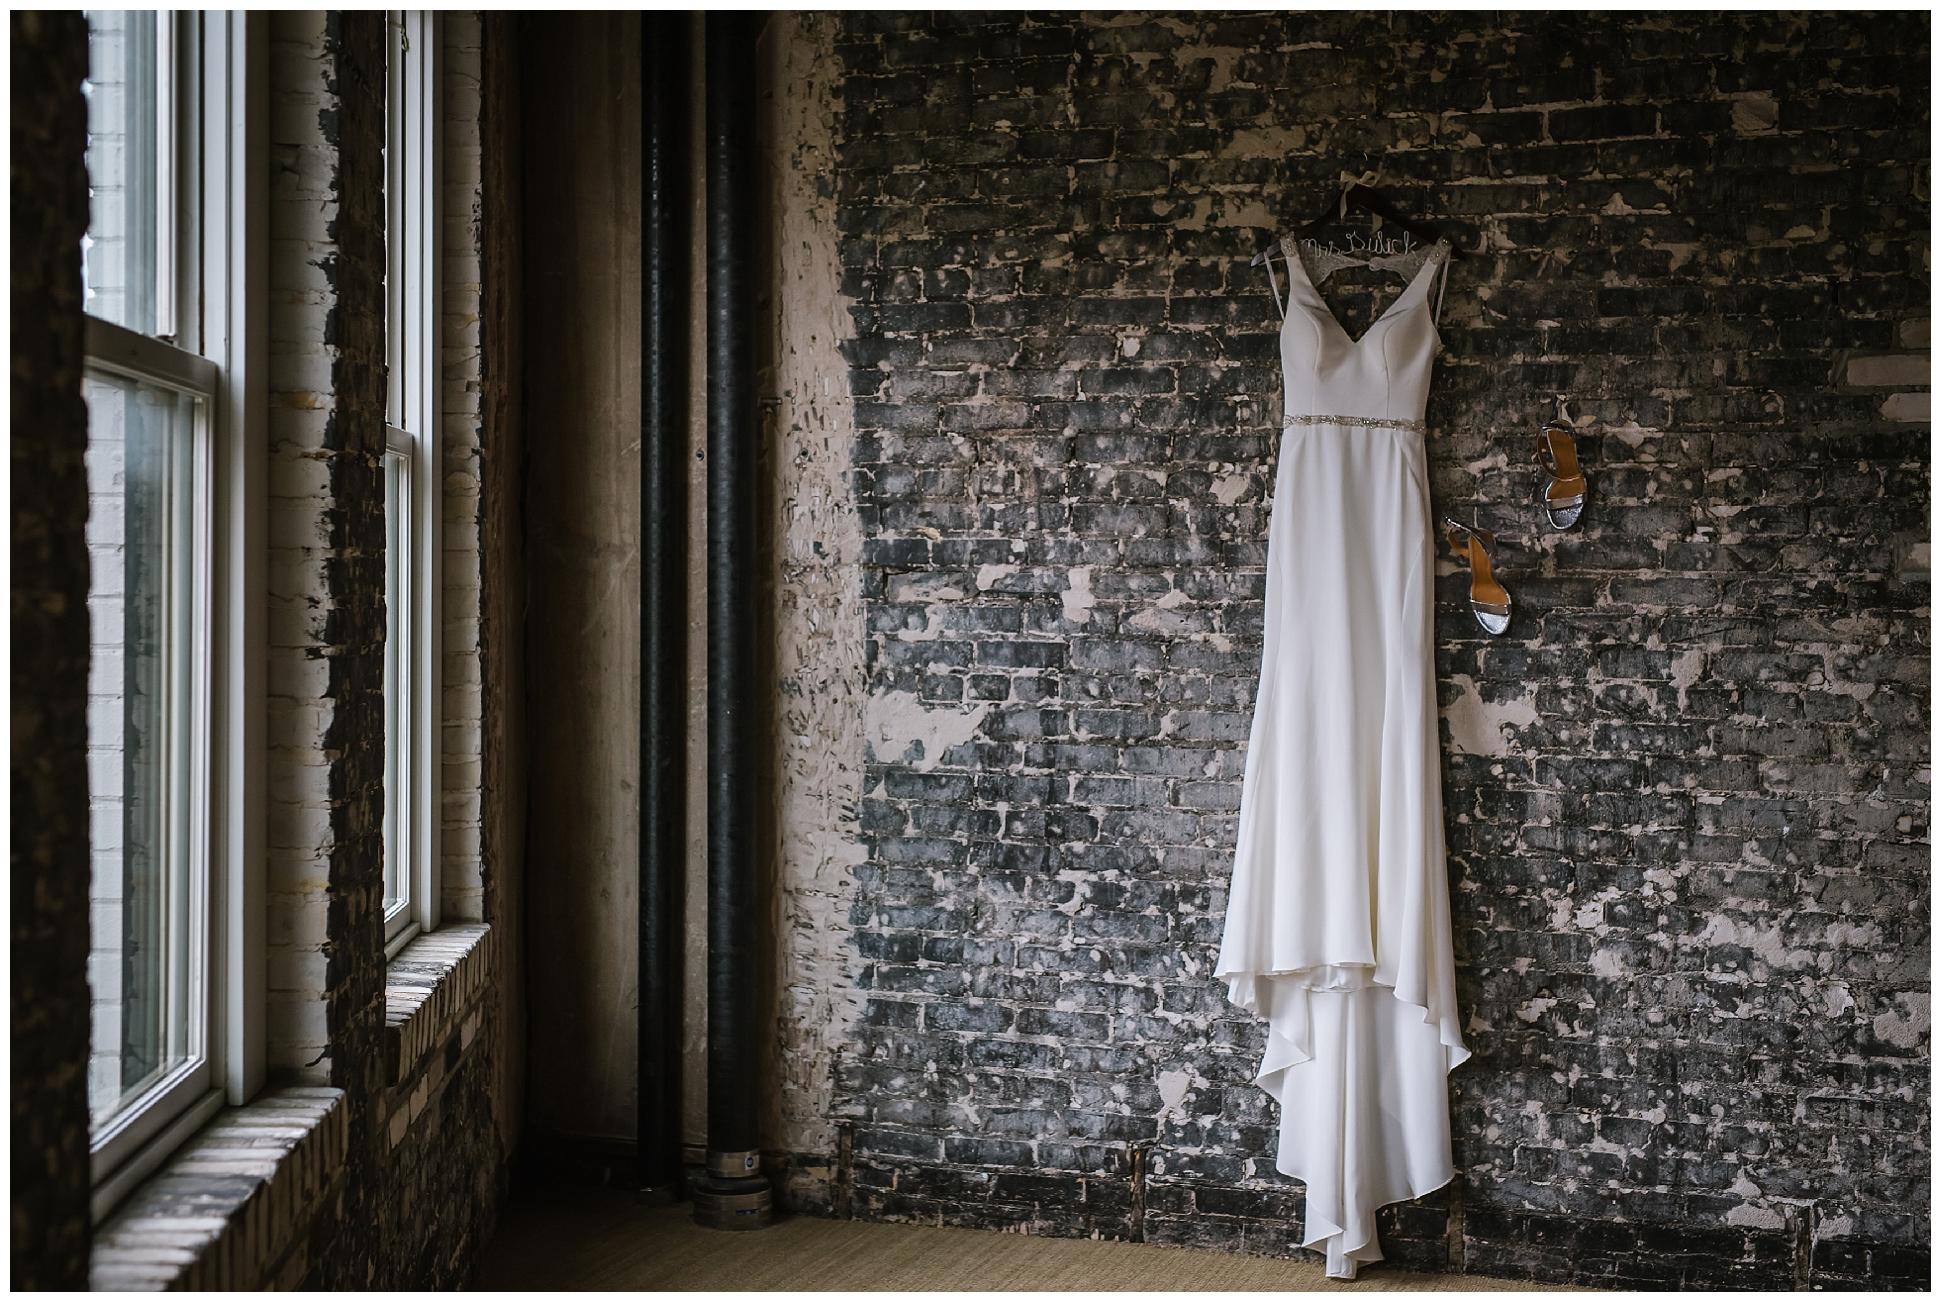 Oxford-exchange-wedding-photogapher-garland-candels-bookstore-burgandy-botanica_0003.jpg